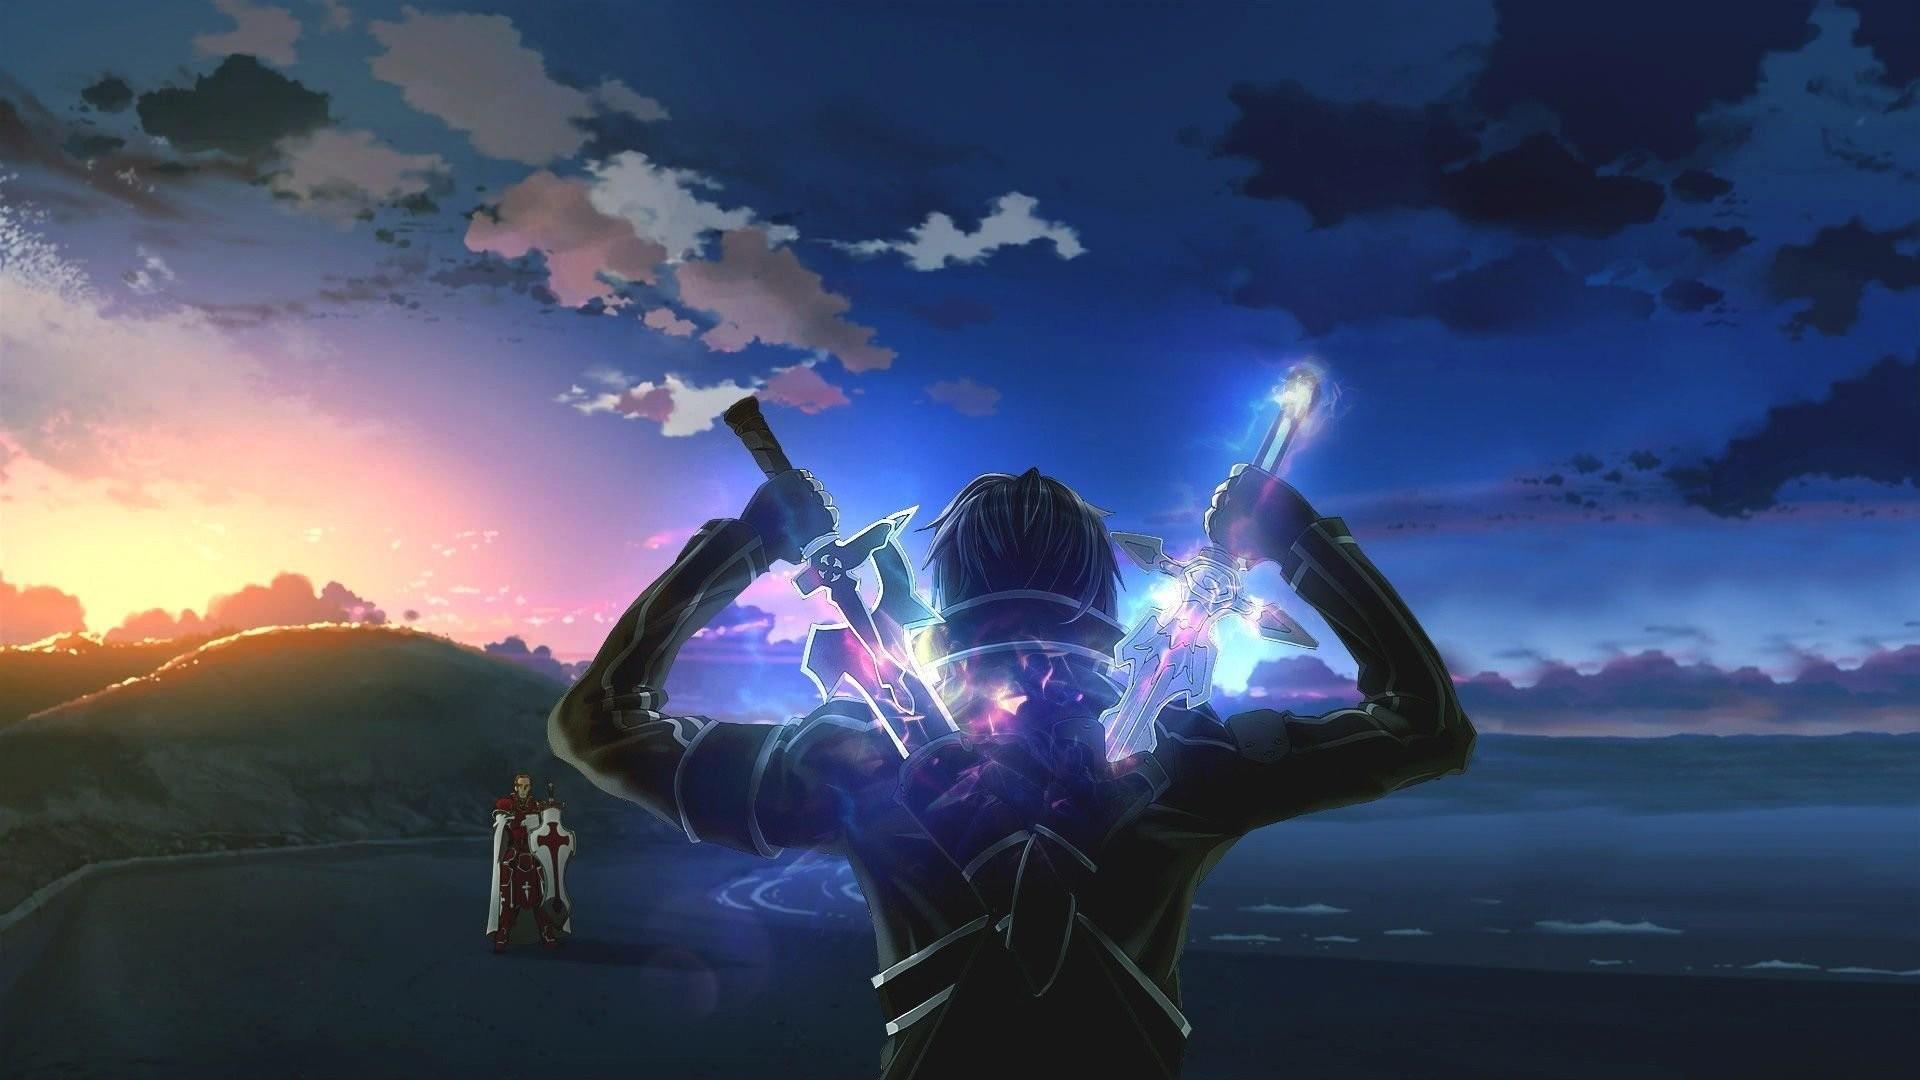 Asuna Yuuki Kirito Sinon Sword Art Online Yui Yuuki Konno · HD Wallpaper |  Background ID:656740